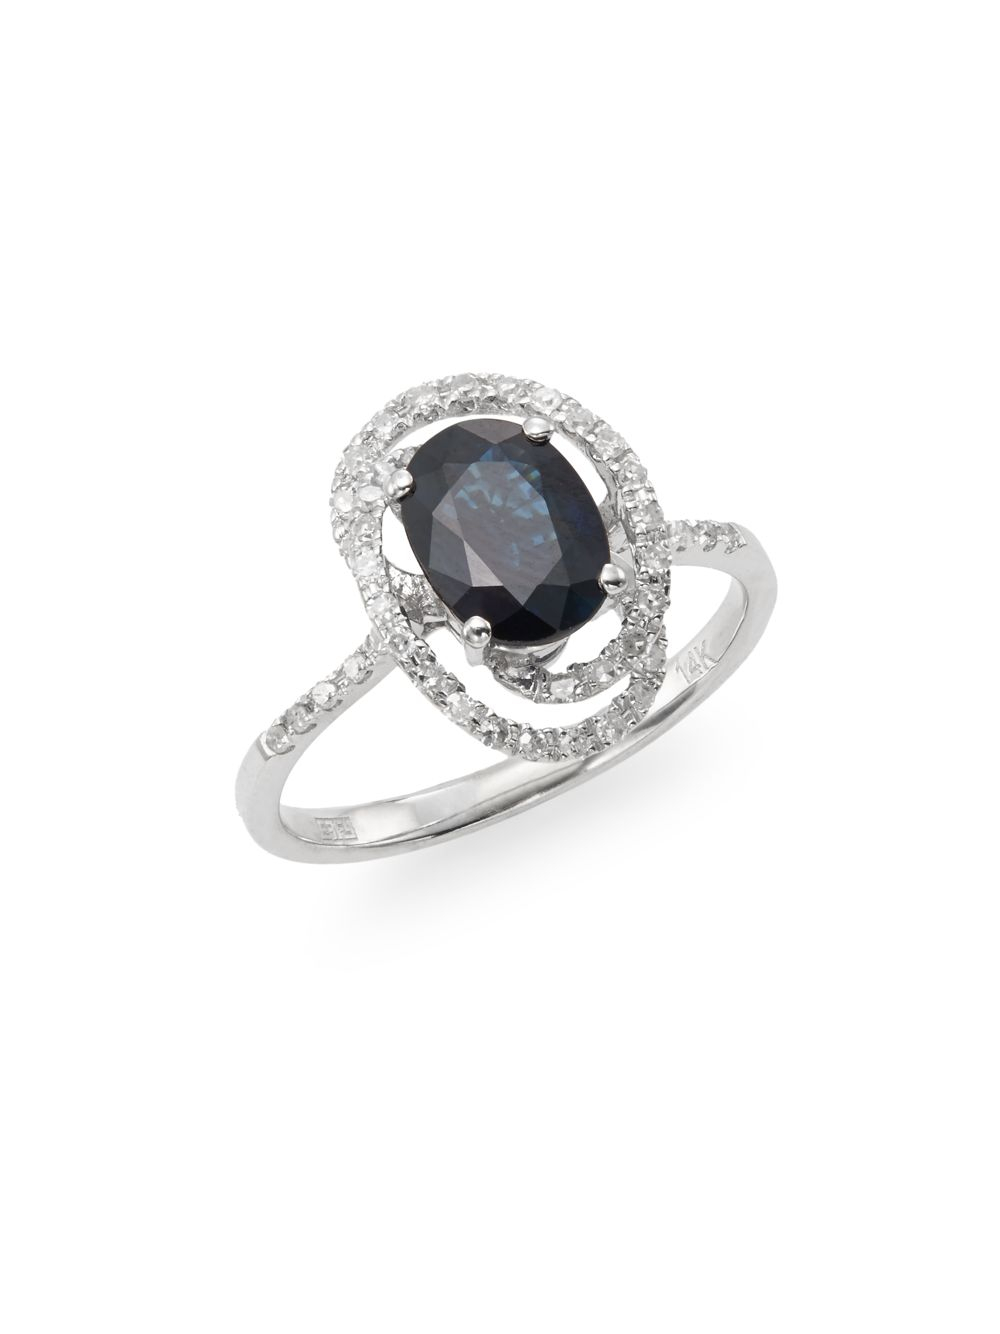 Effy Black And White Diamond Ring